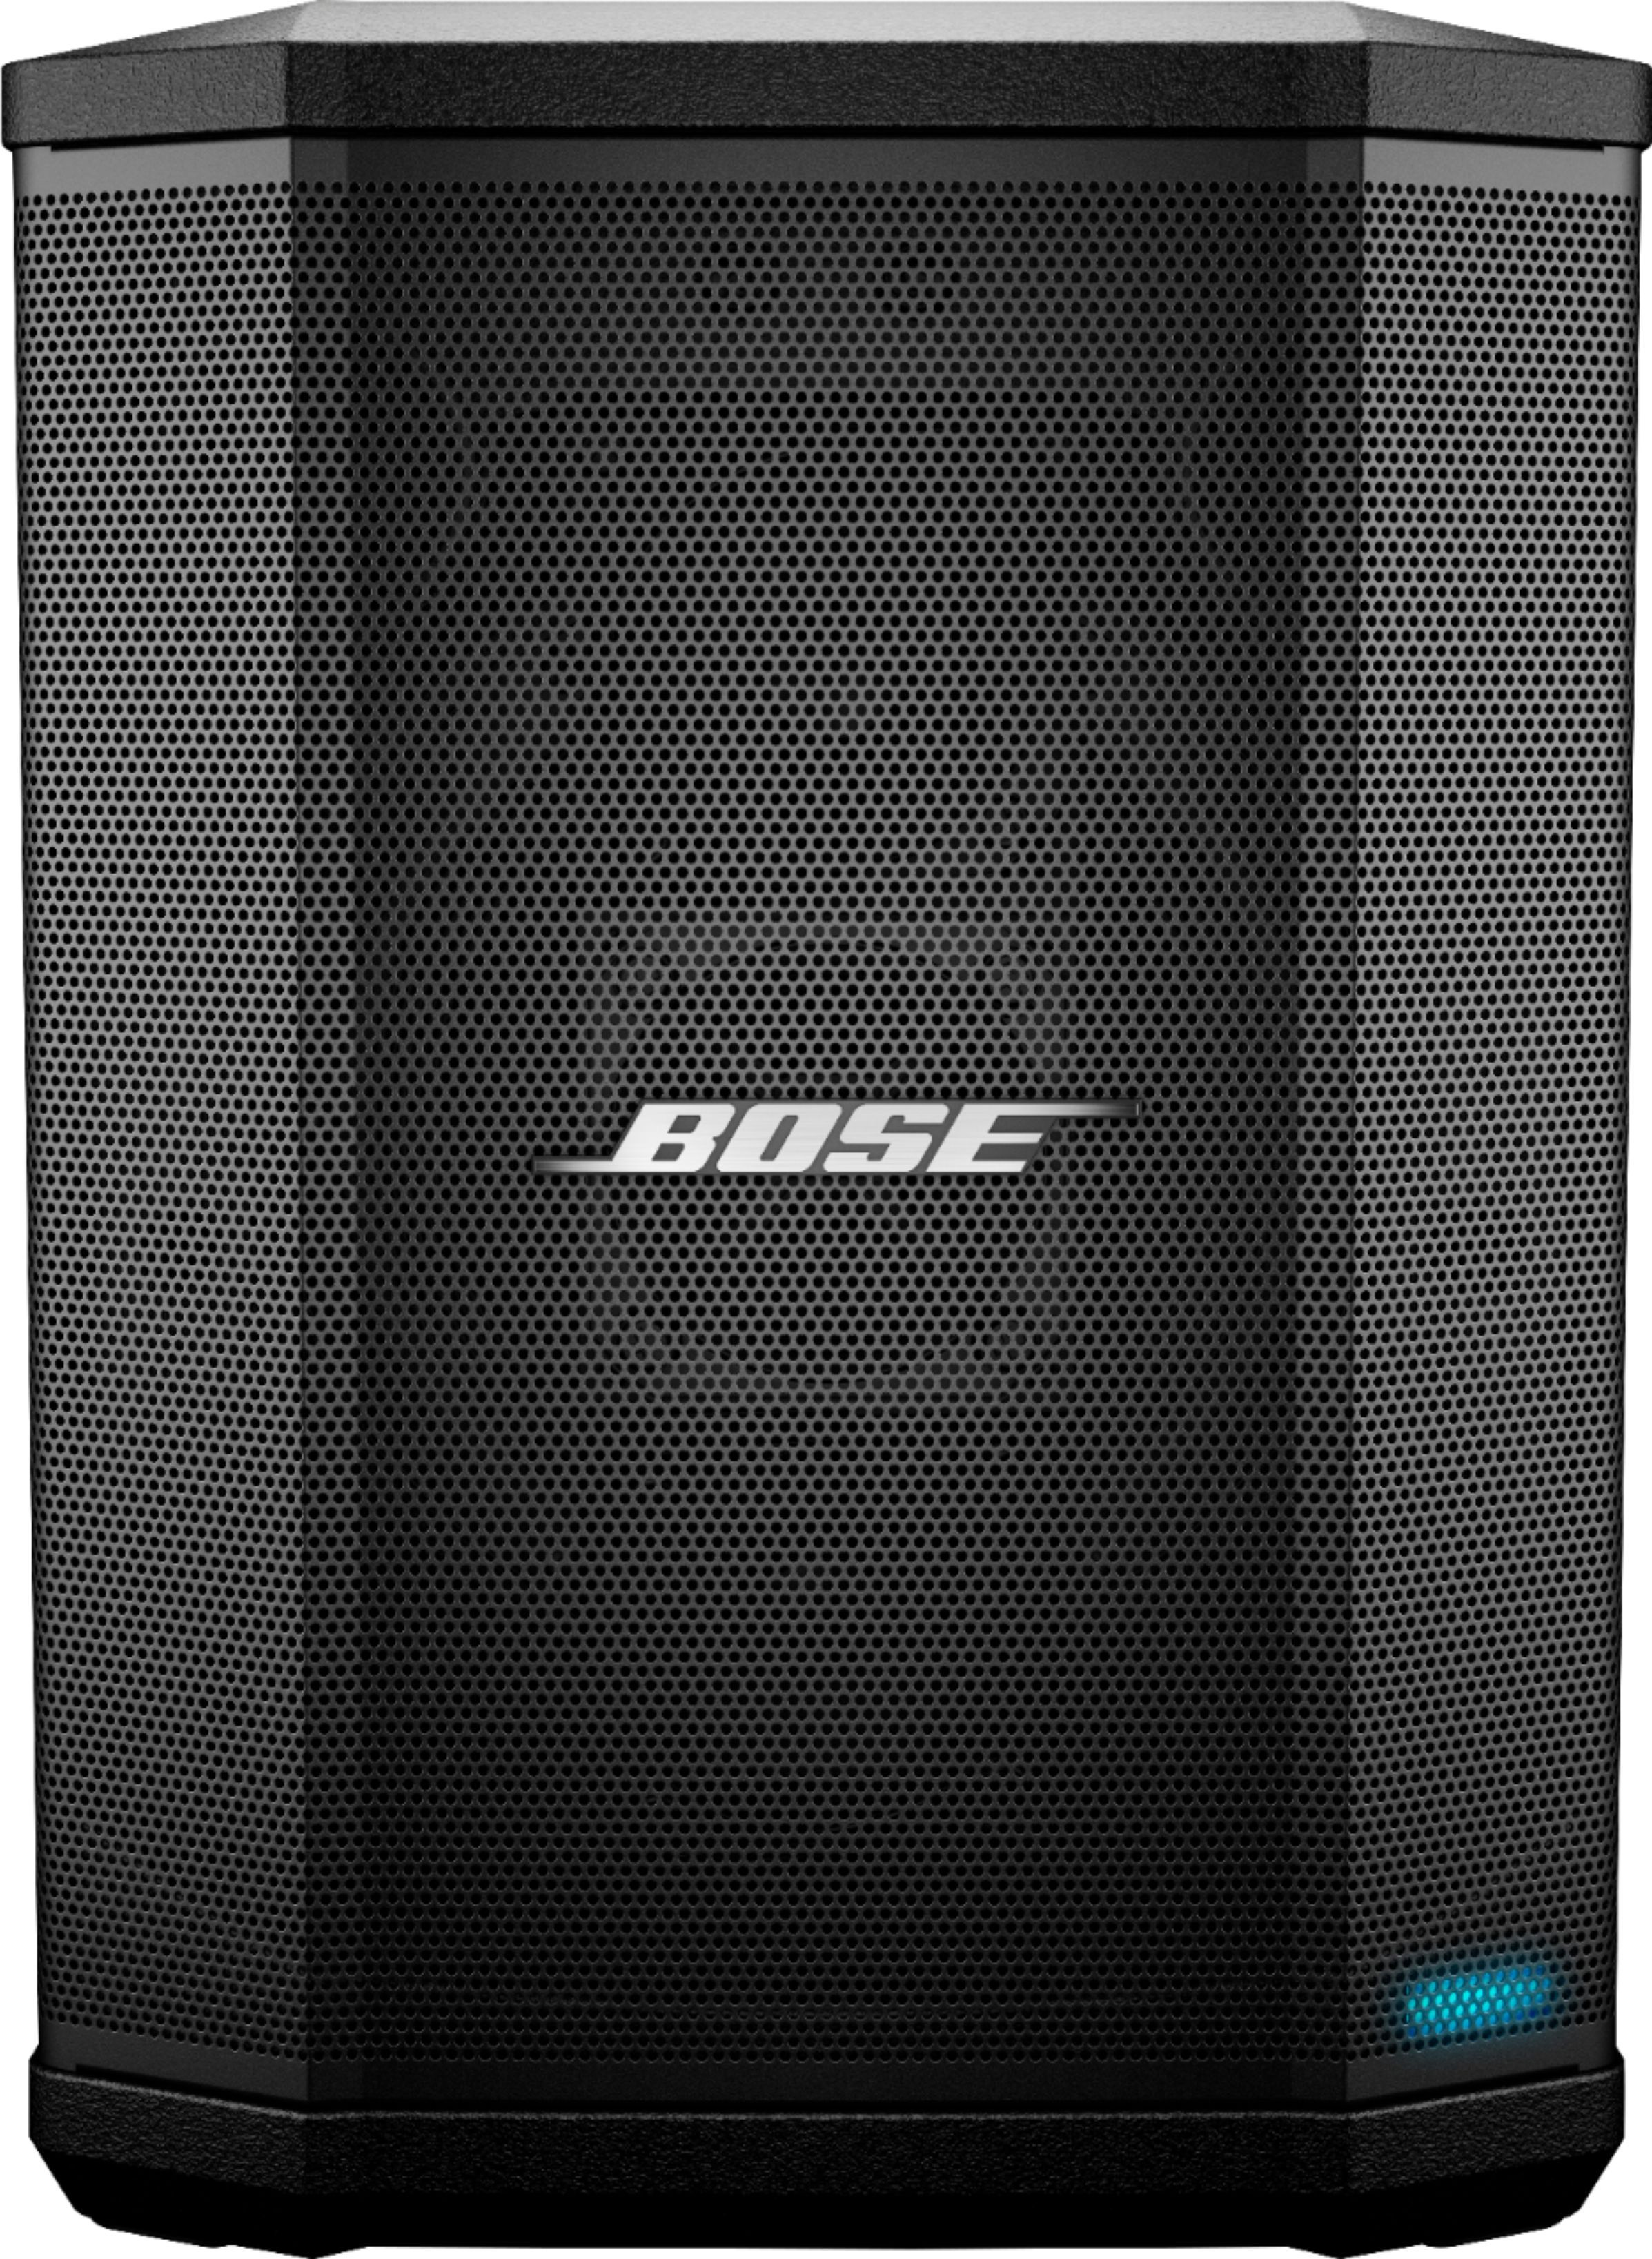 Best Buy Bose S1 Pro Portable Bluetooth Speaker And Pa System Black 787930 1120 Bluetooth Speakers Portable Bluetooth Speaker Bluetooth